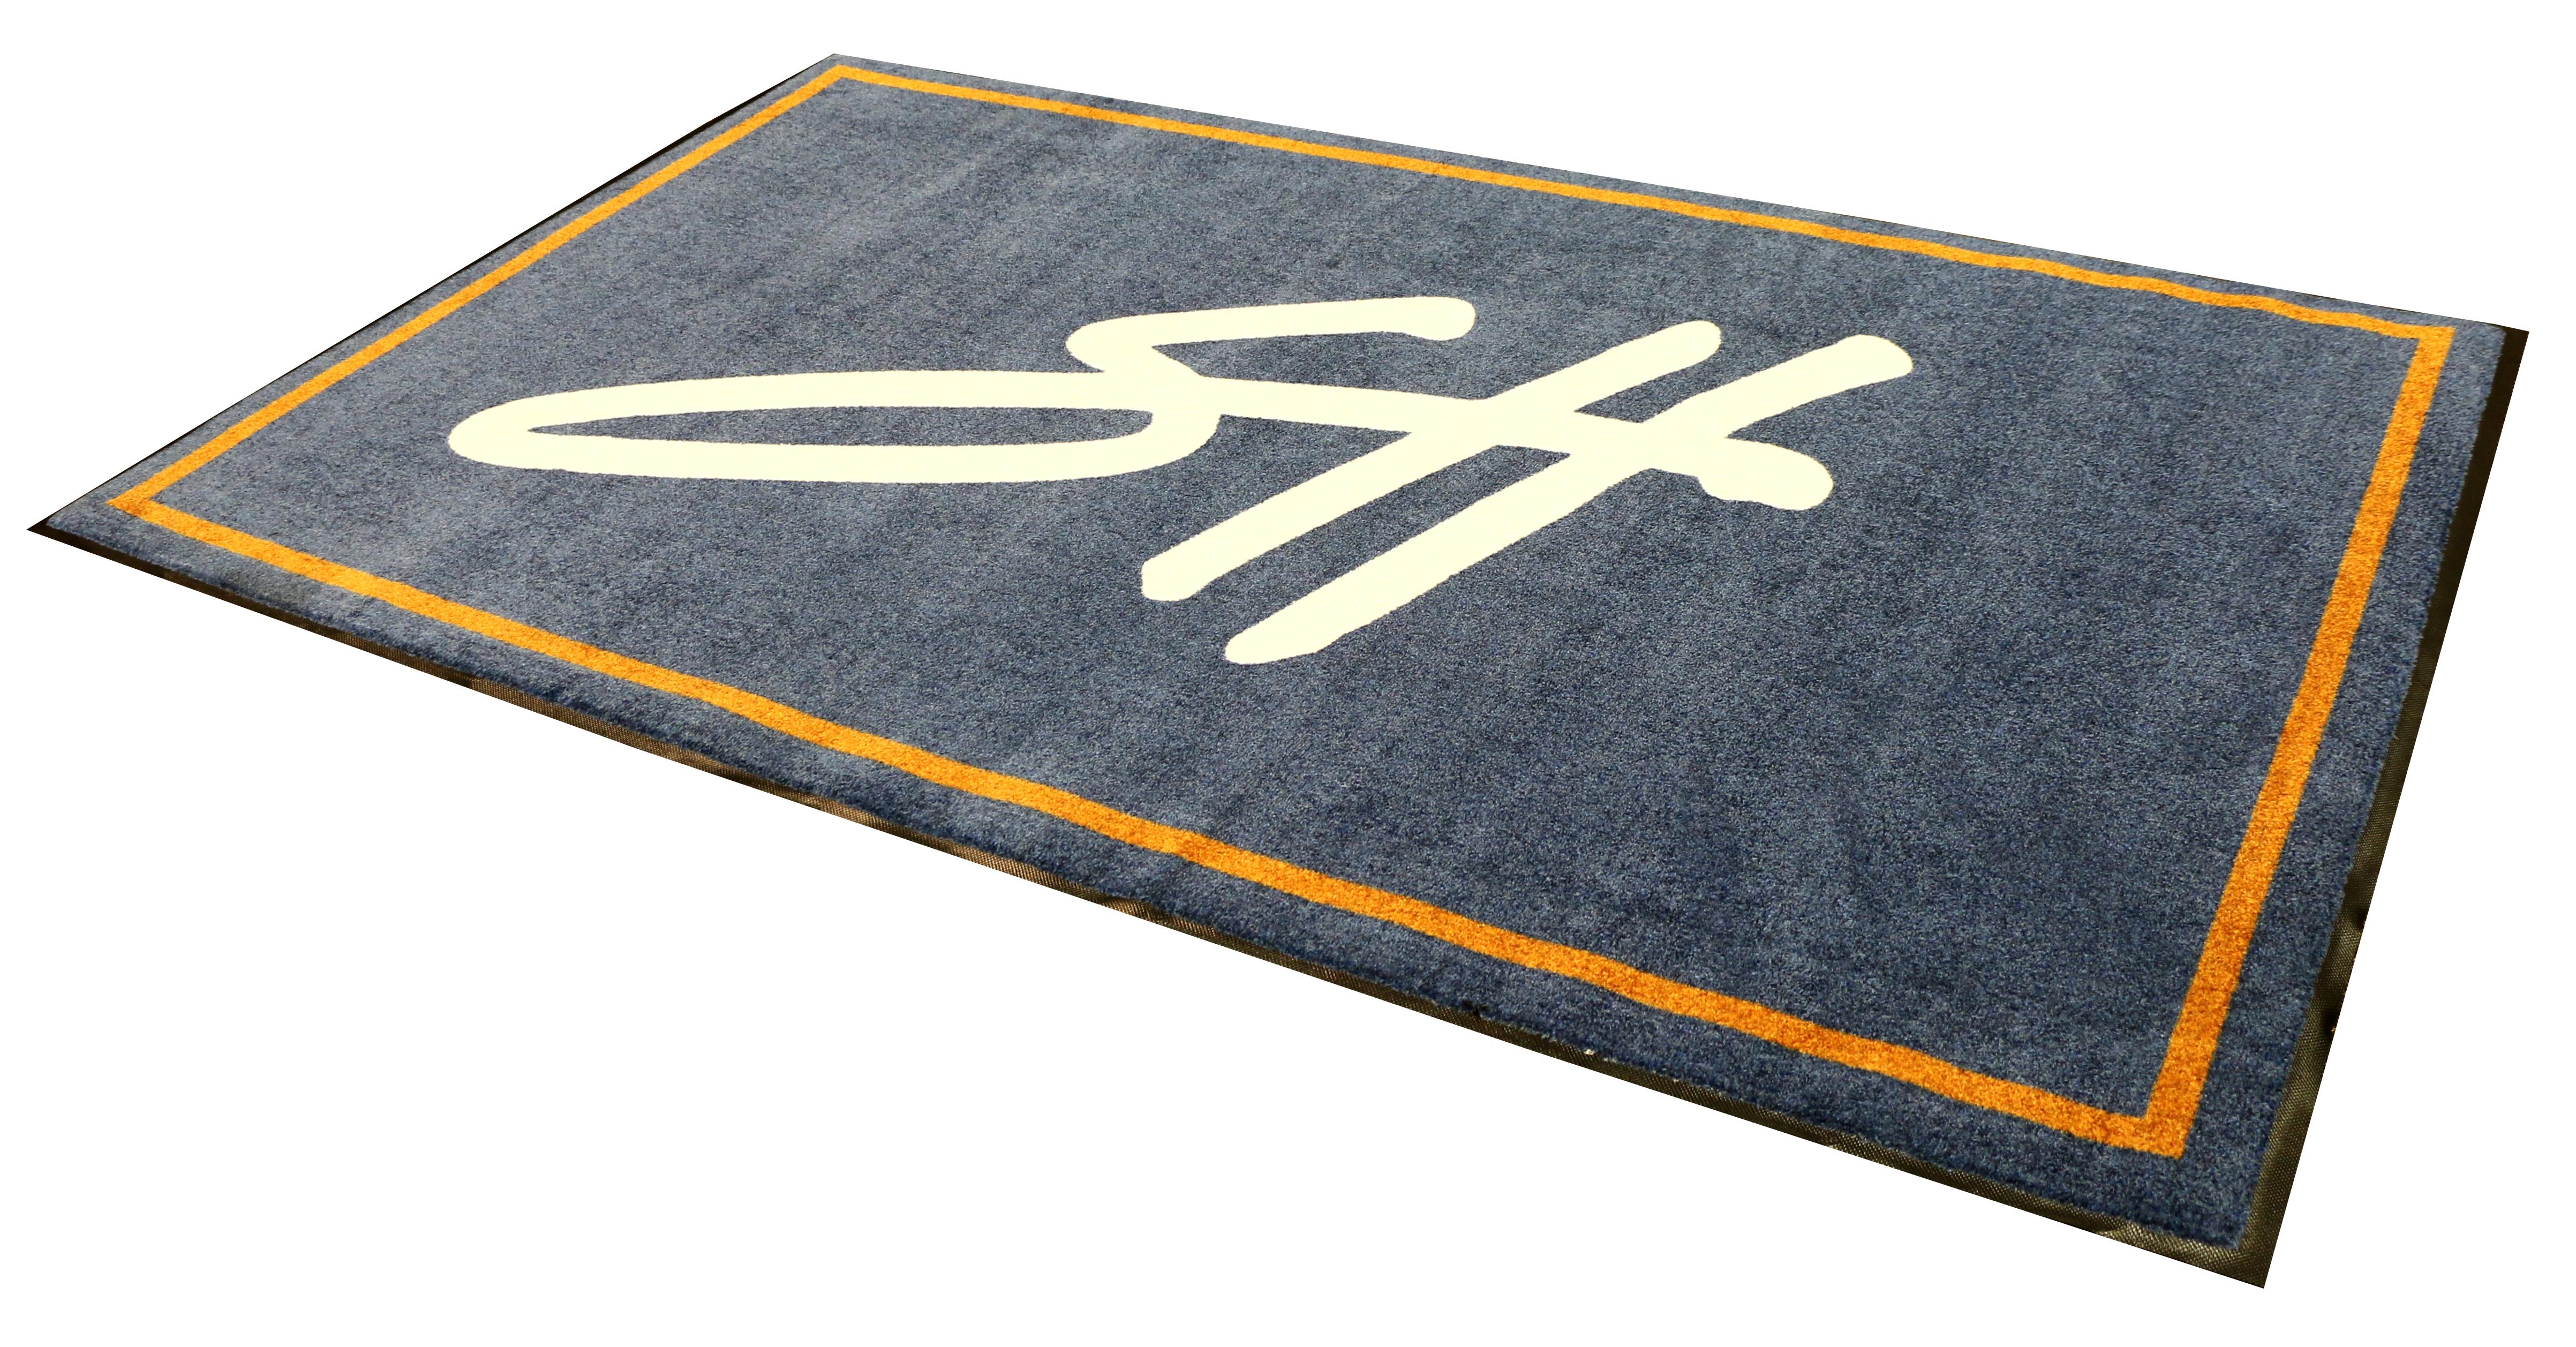 School Health-(logo rug)